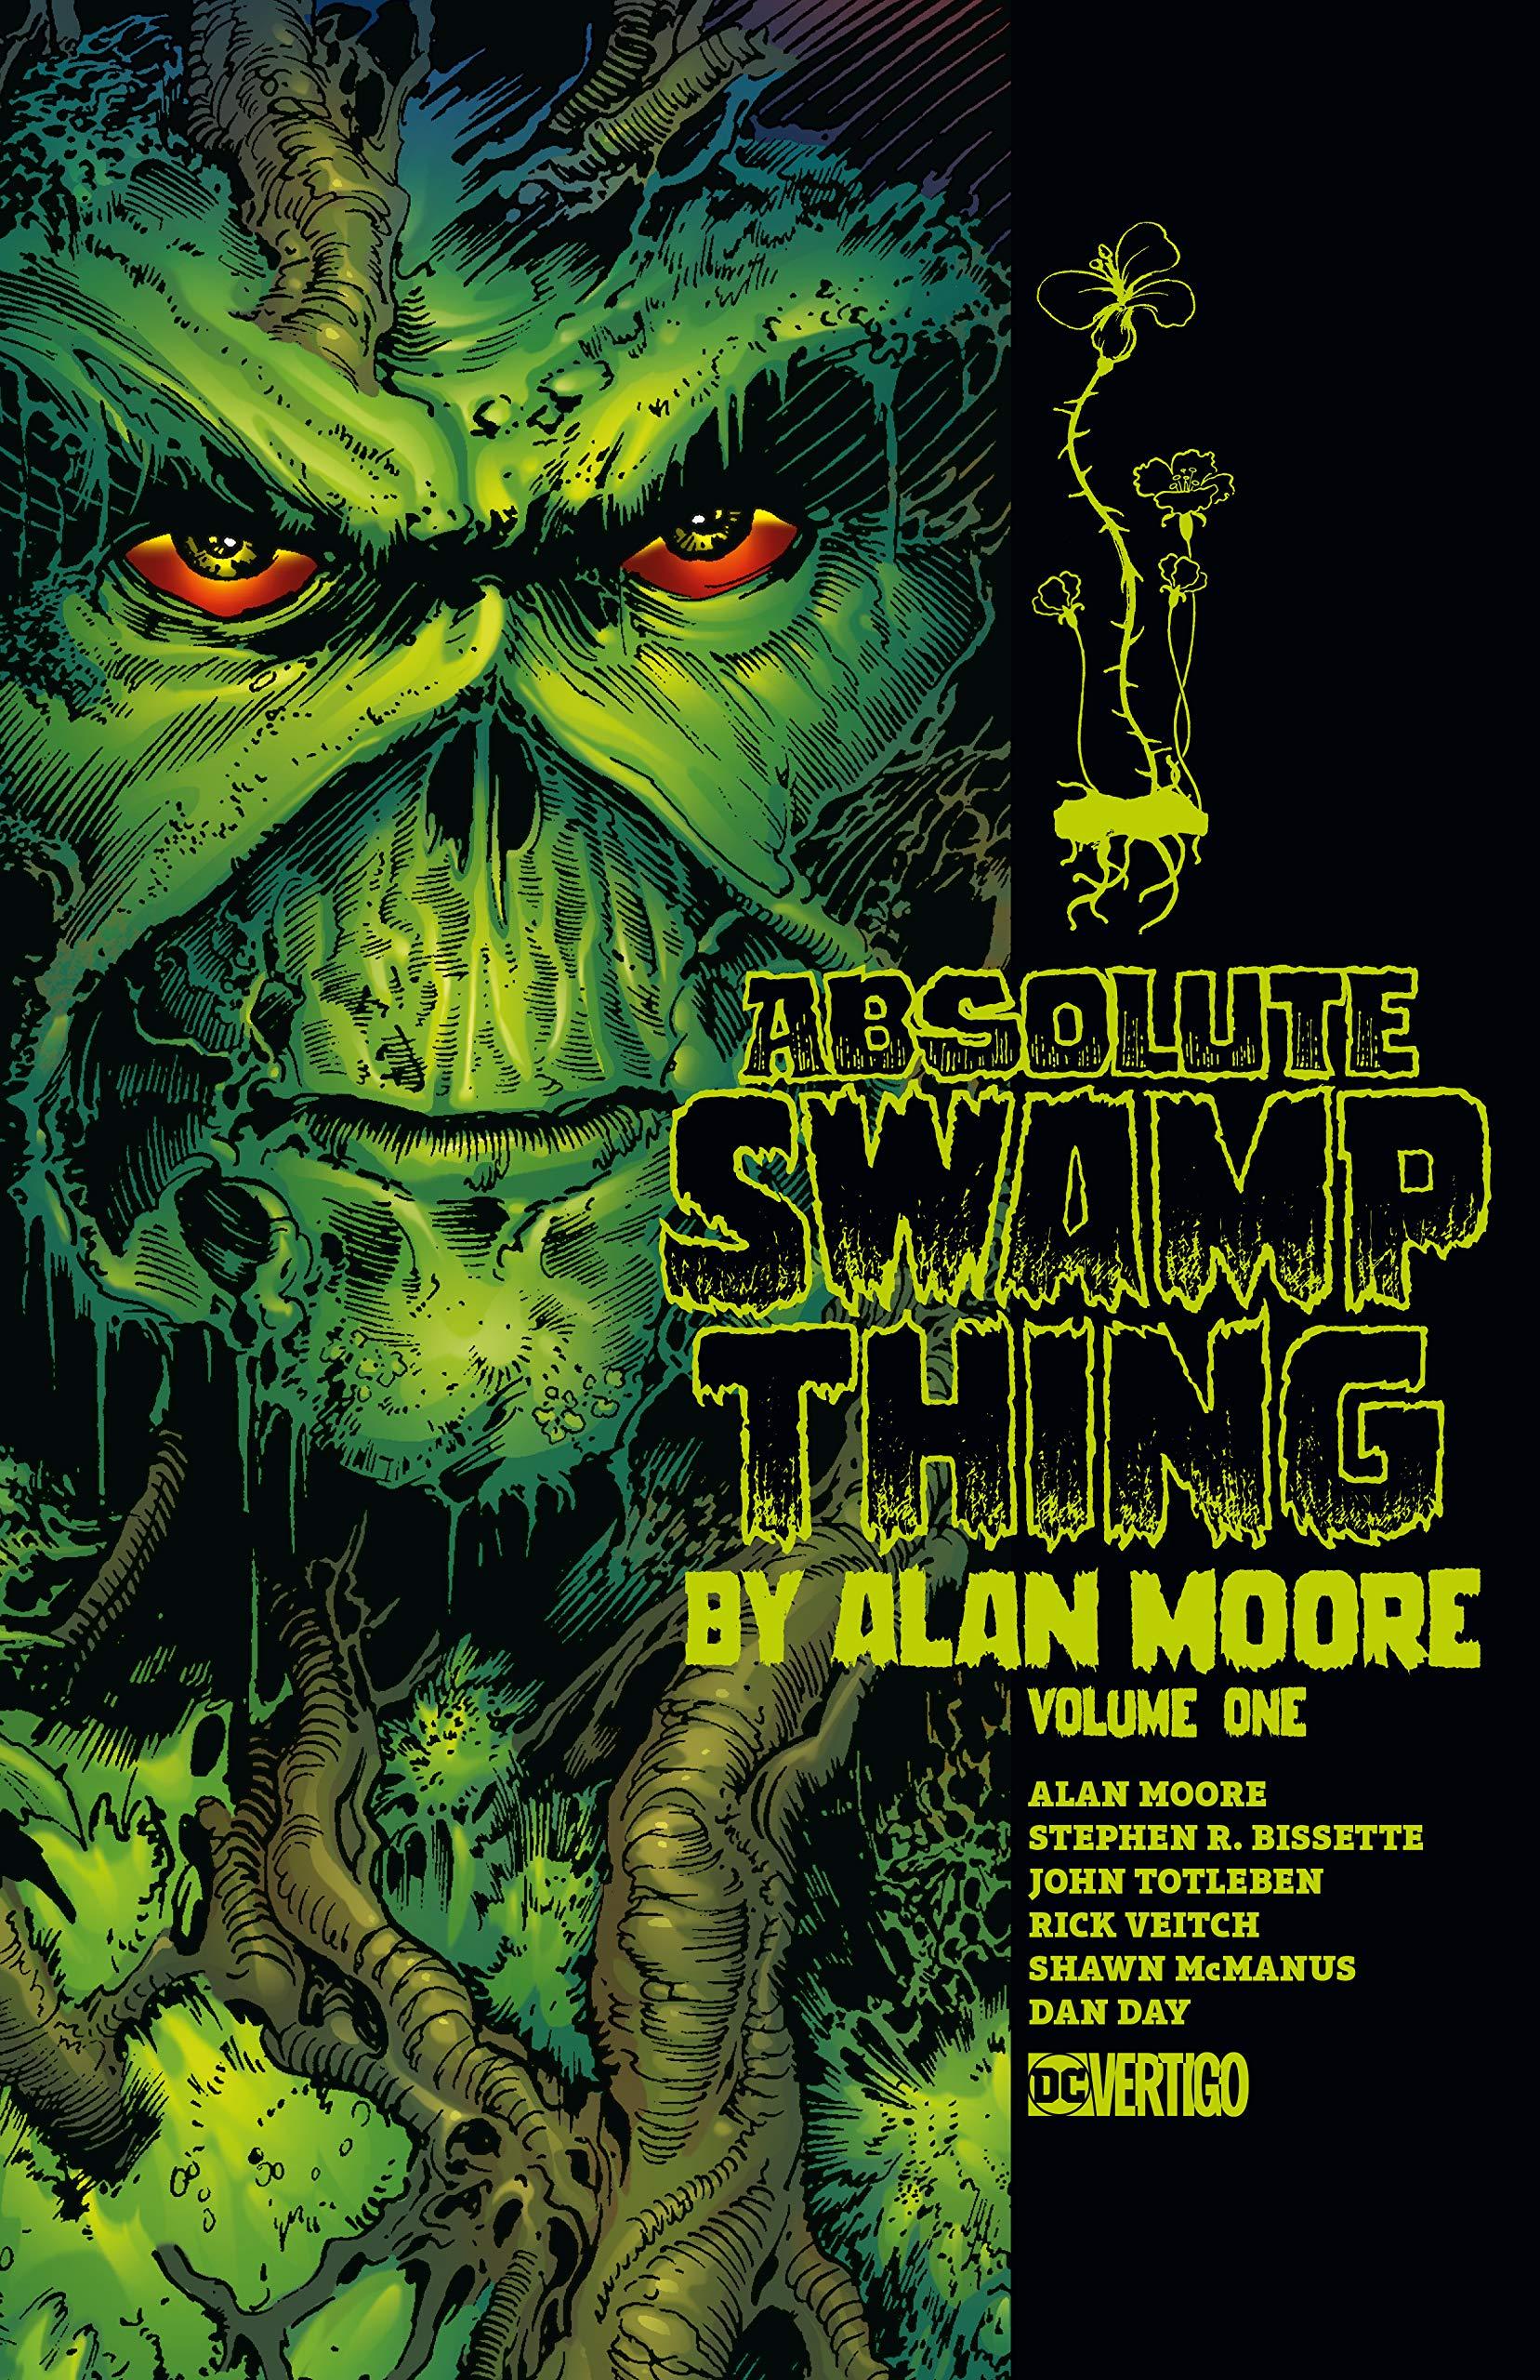 Absolute Swamp Thing by Alan Moore, Vol. 1 by Alfredo Alcalá, John Costanza, Alan Moore, Stephen R. Bissette, Rick Veitch, John Totleben, Tatjana Woods, Shawn McManus, Dan Day, Ron Randall